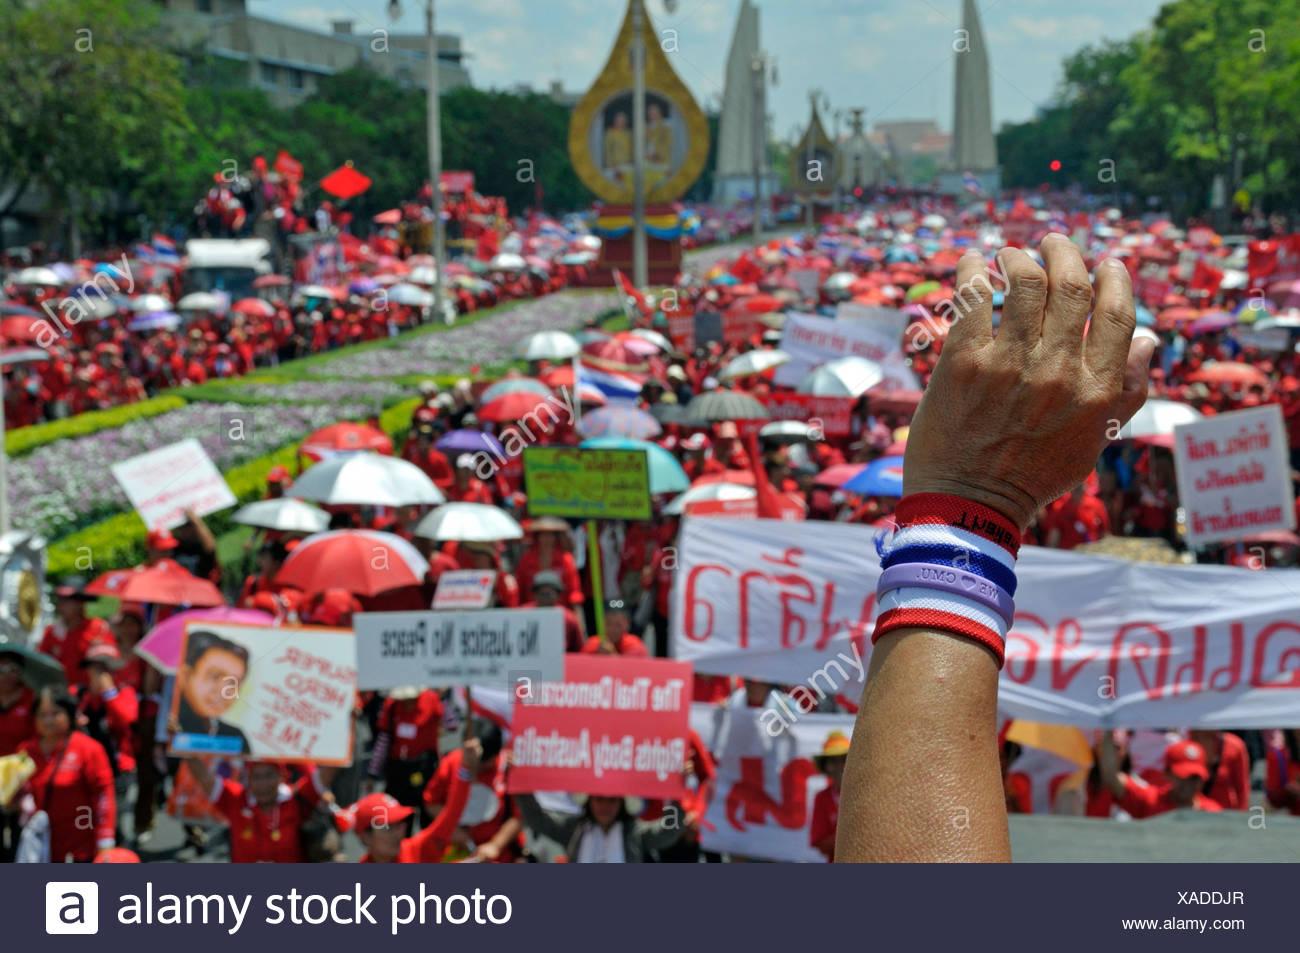 Thaksin Shinawatra followers demonstrating in Bangkok, Thailand, Asia Stock Photo